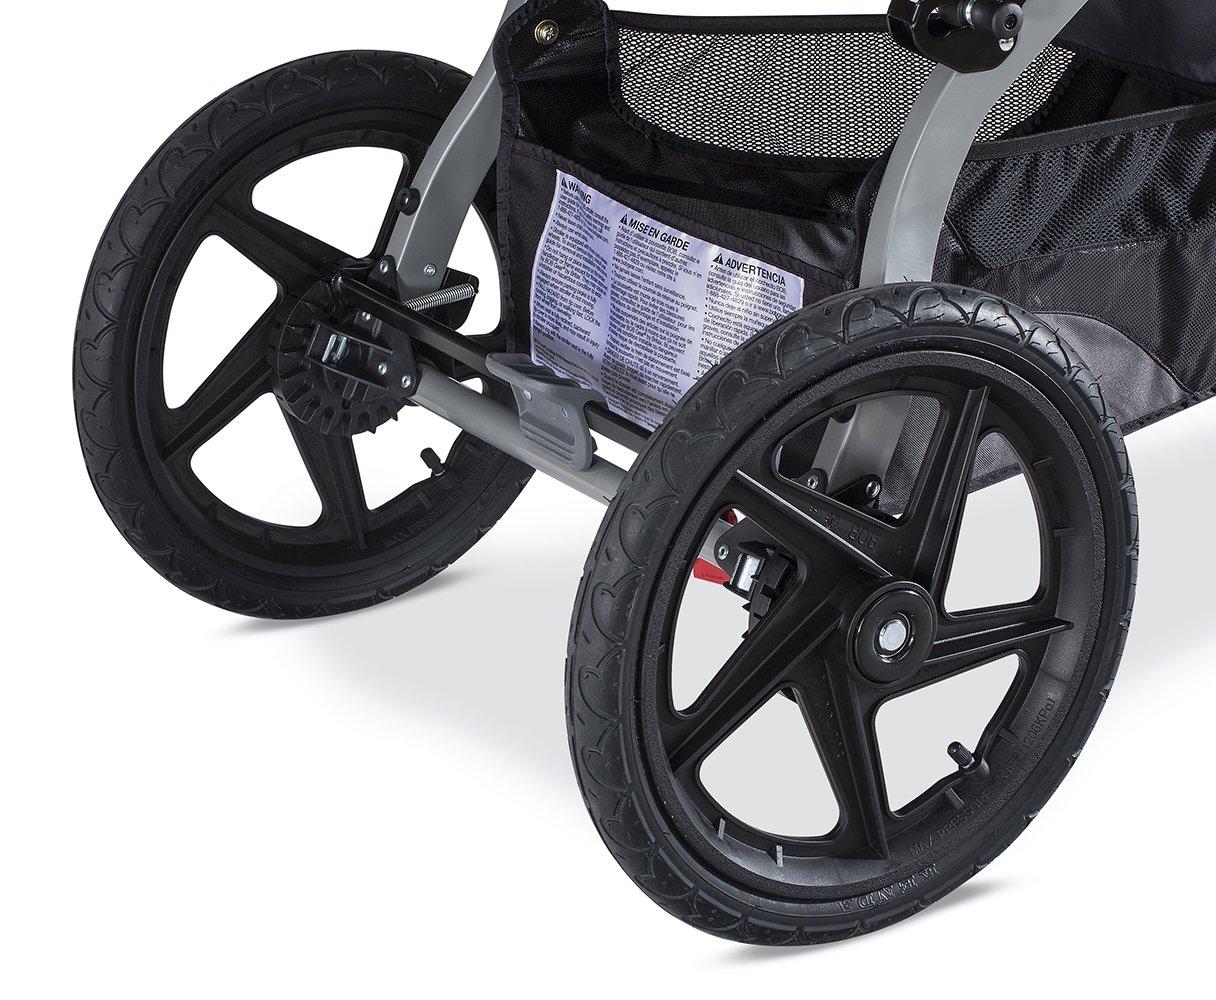 BOB Revolution PRO Jogging Stroller, Black by BOB Gear (Image #10)